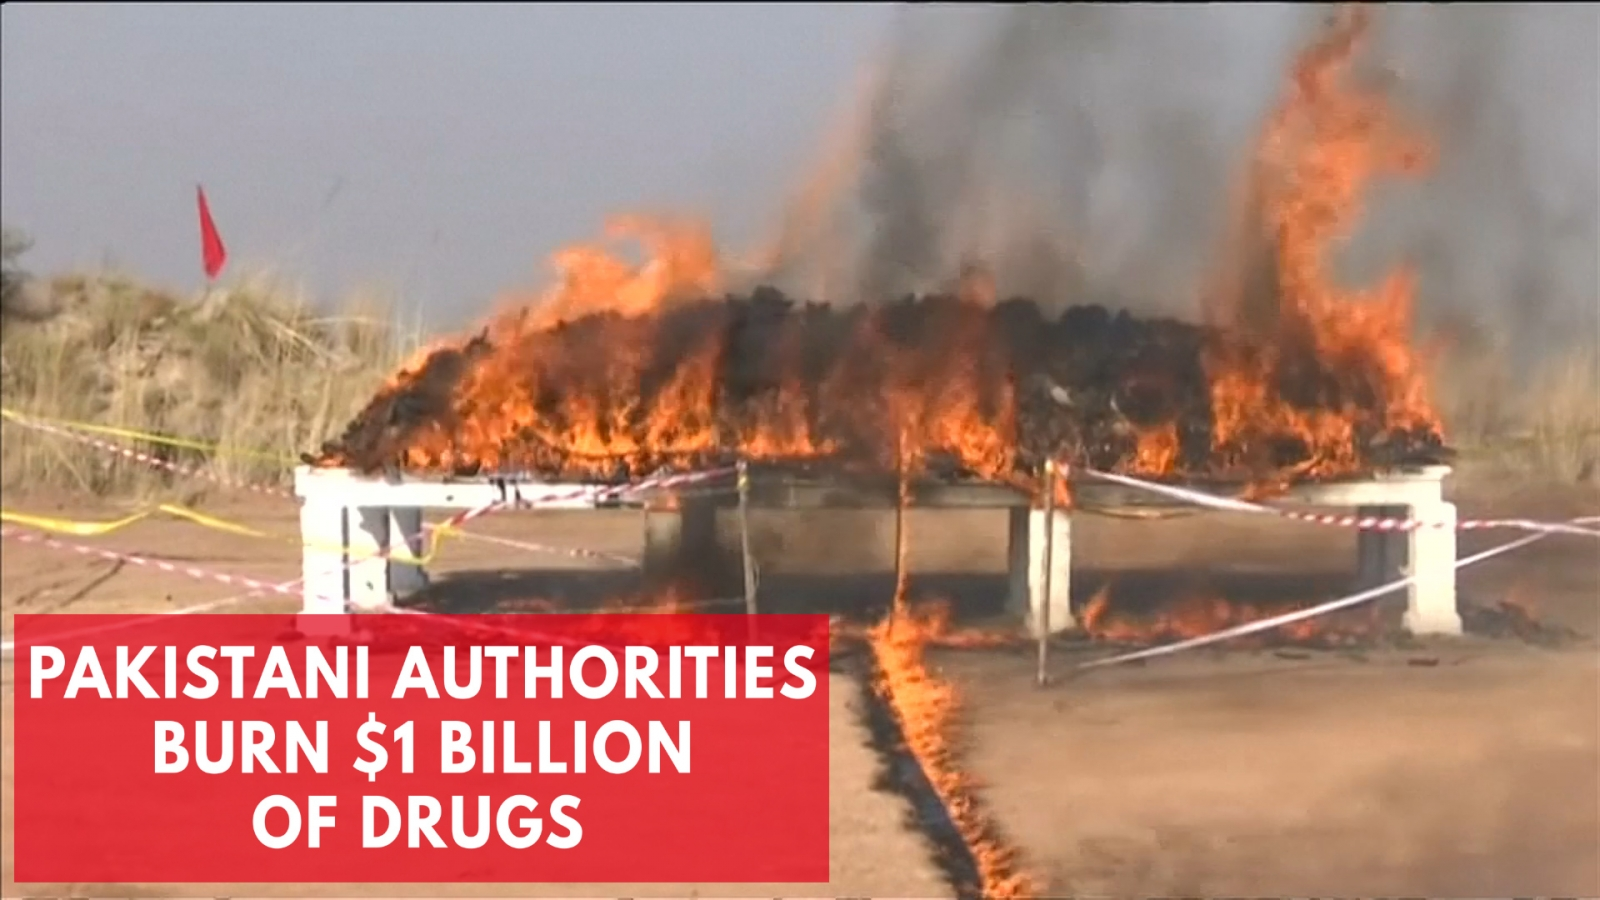 $1 Billion Of Drugs Burned By Pakistani Authorities